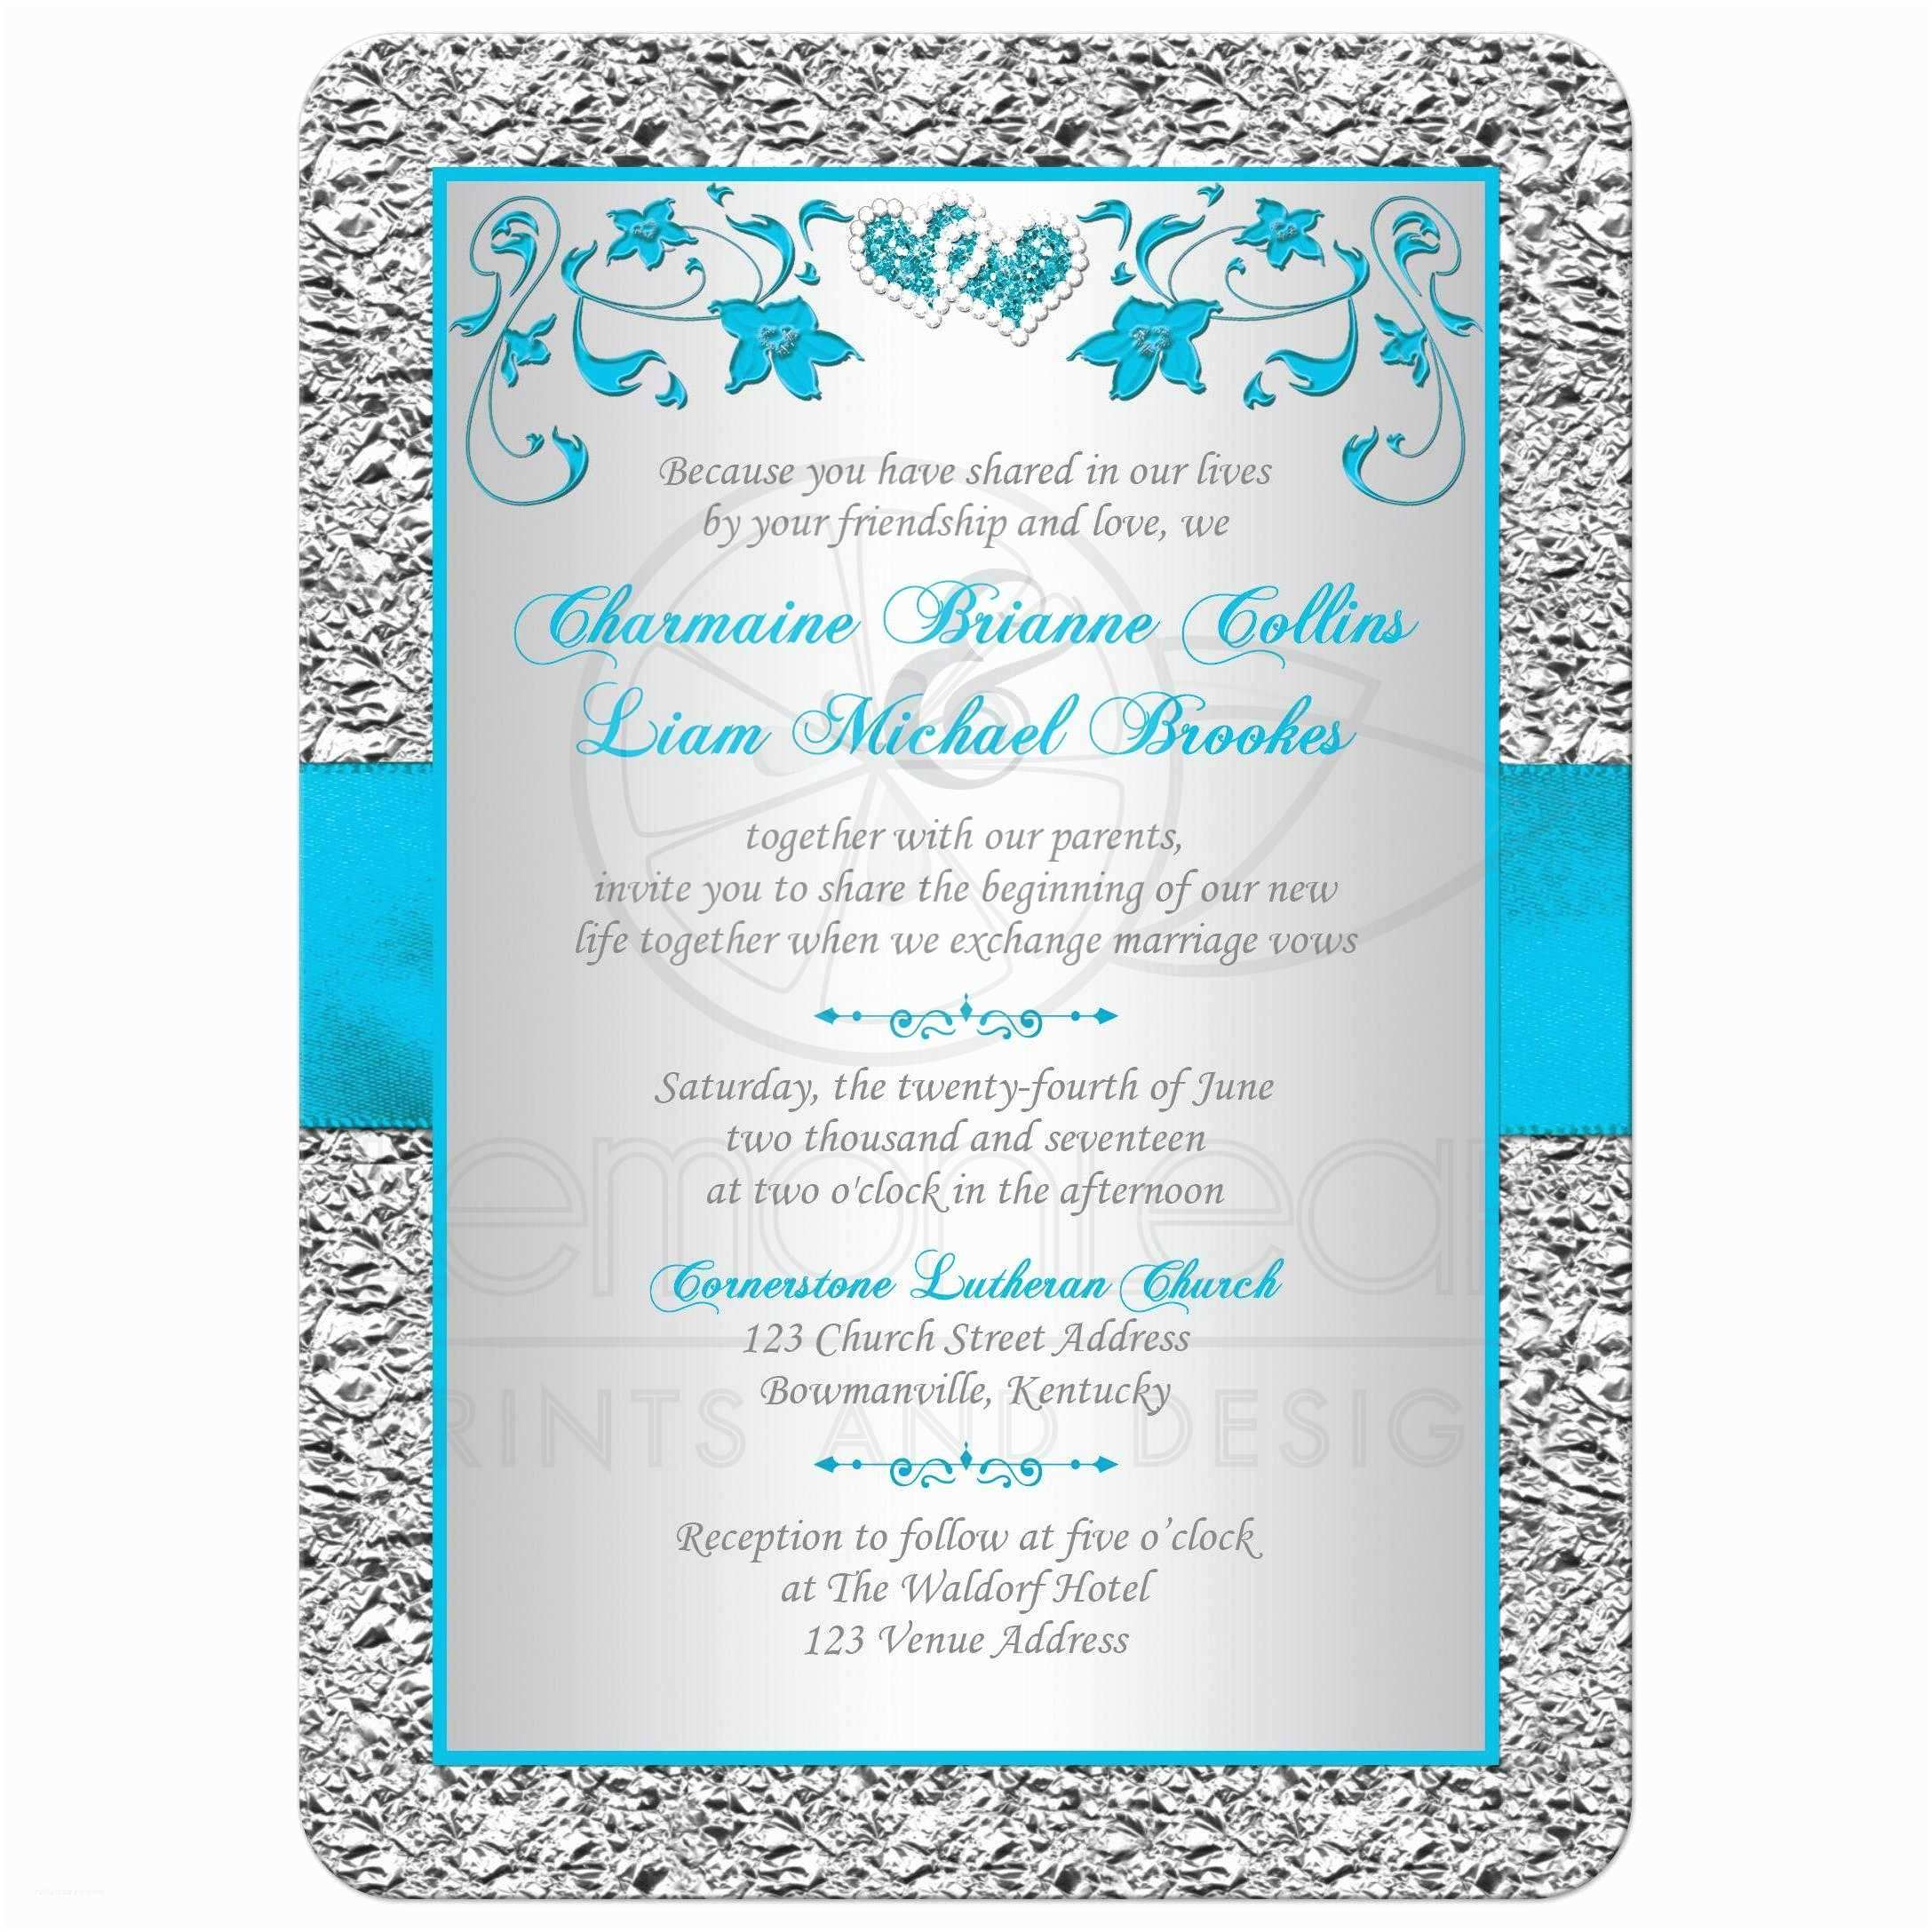 Turquoise Wedding Invitations Wedding Invitation Turquoise Silver Floral